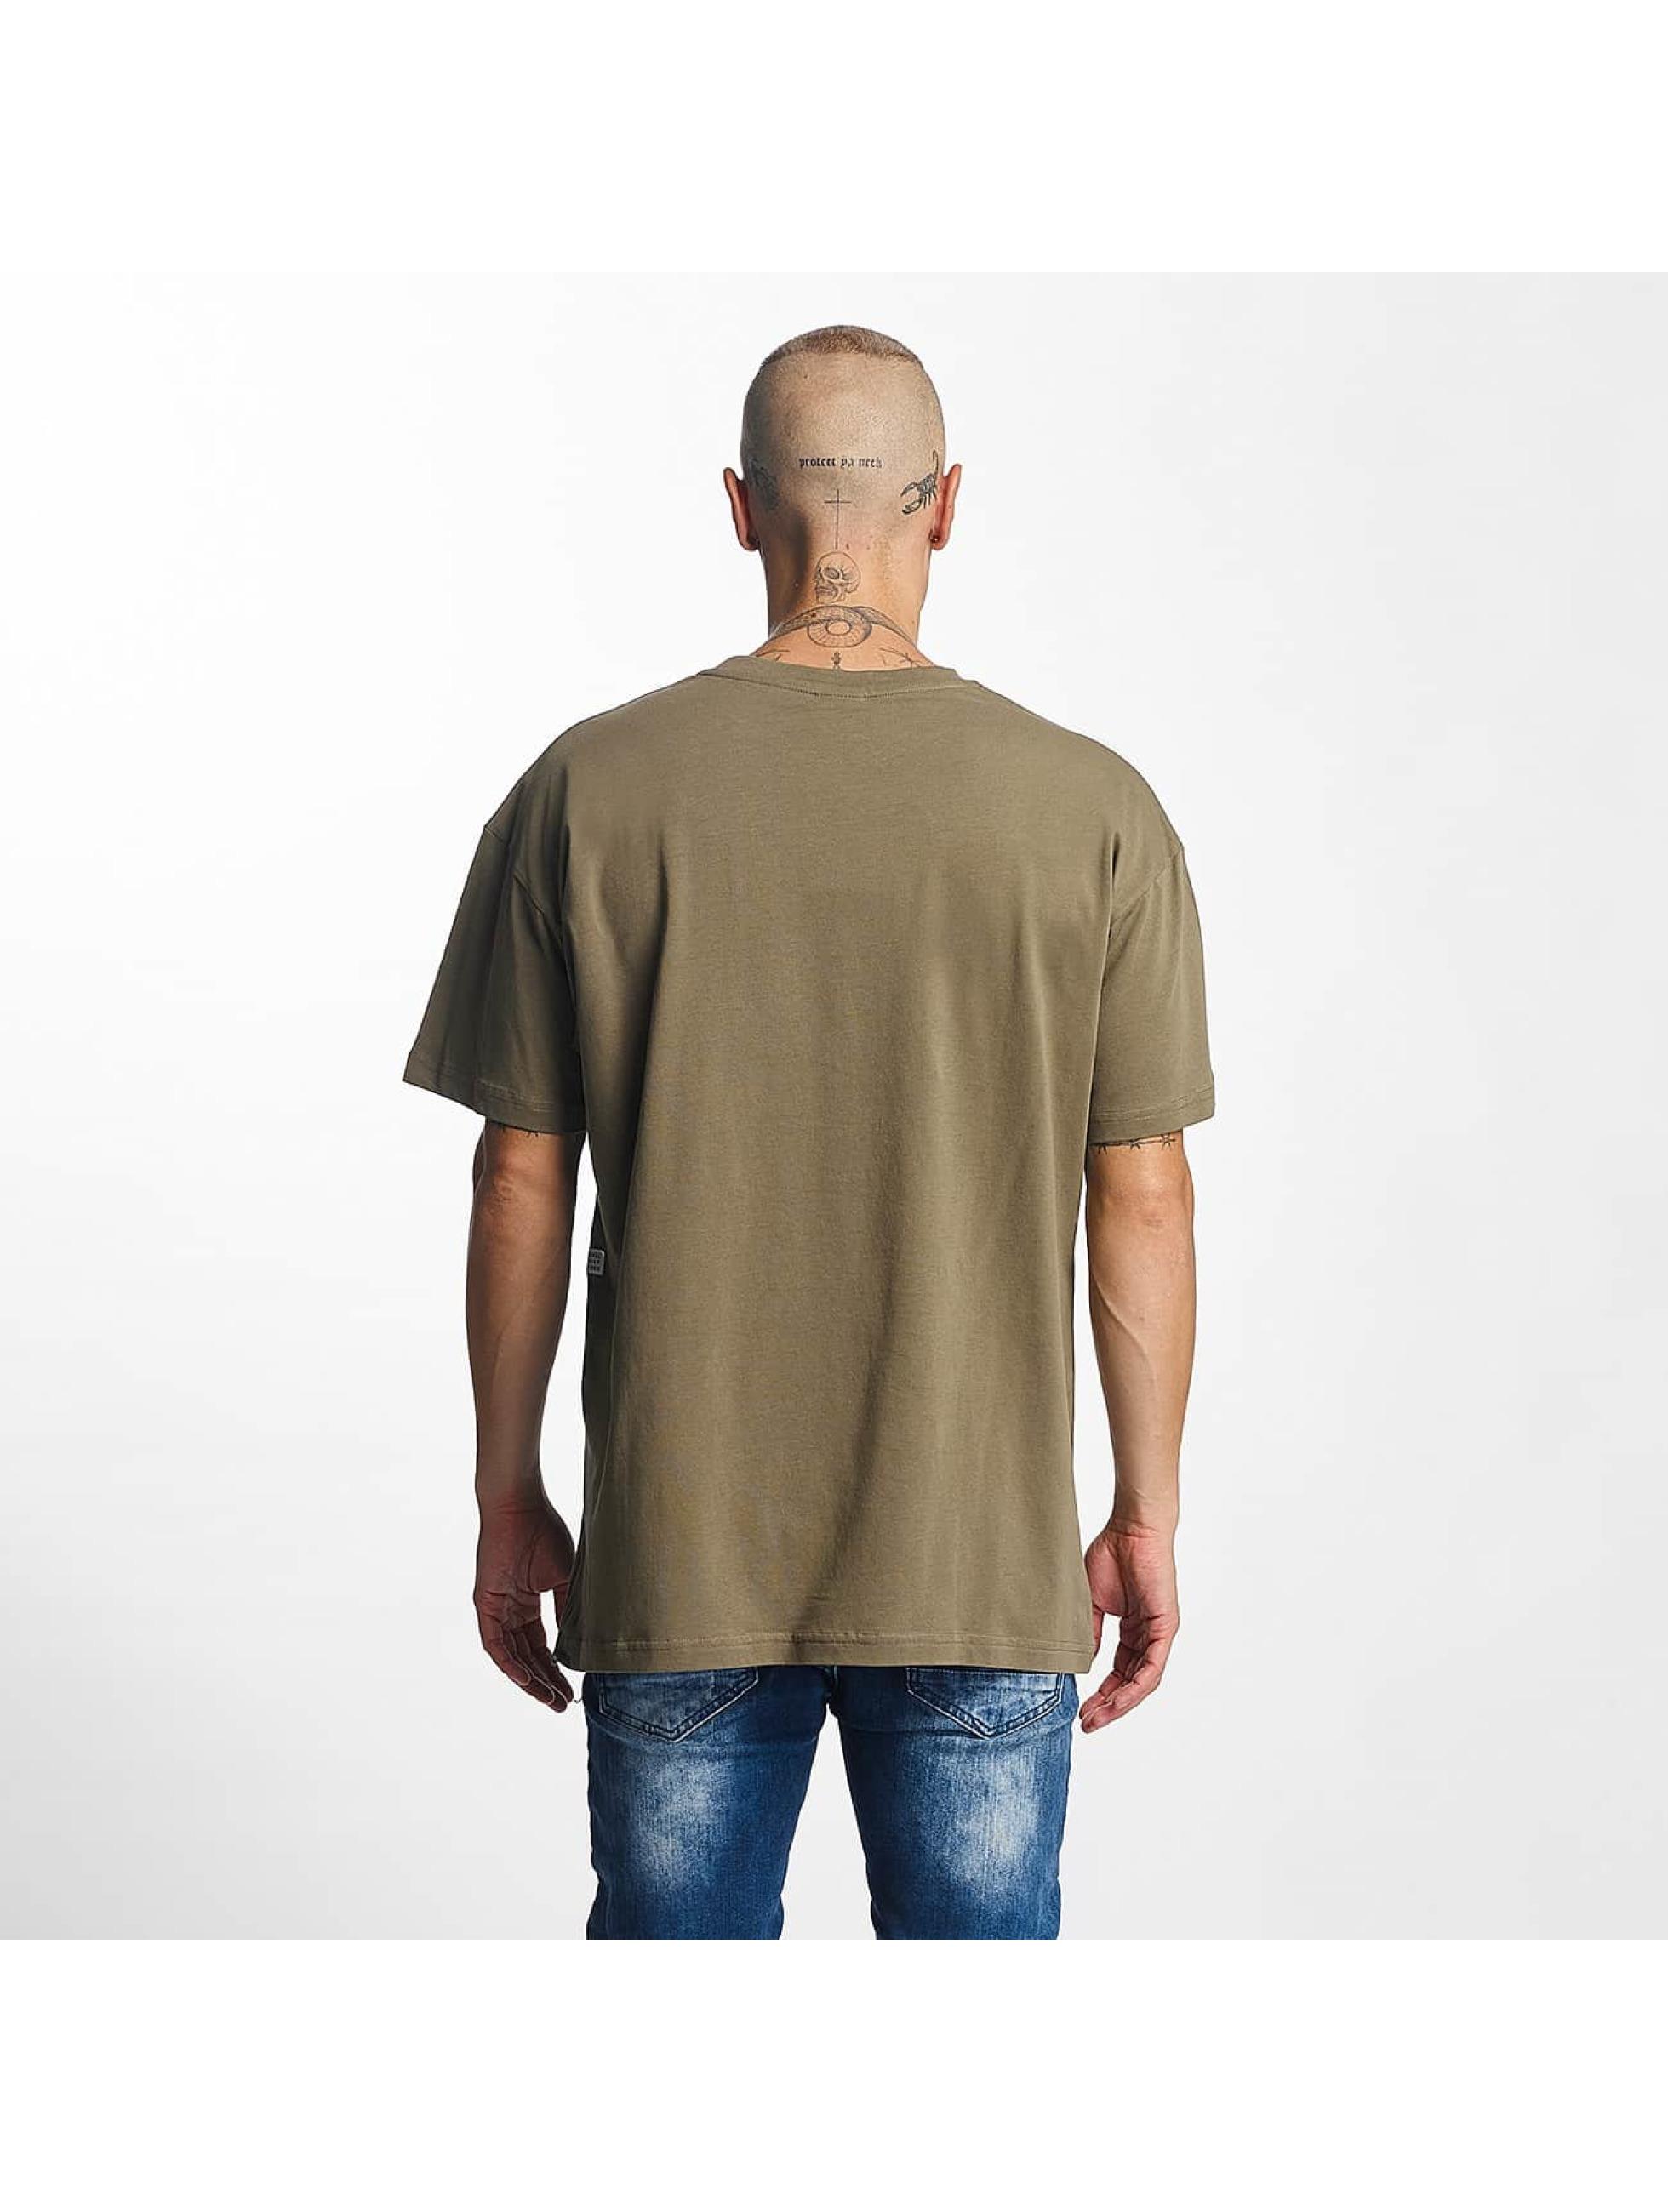 K1X T-Shirt Crest olive